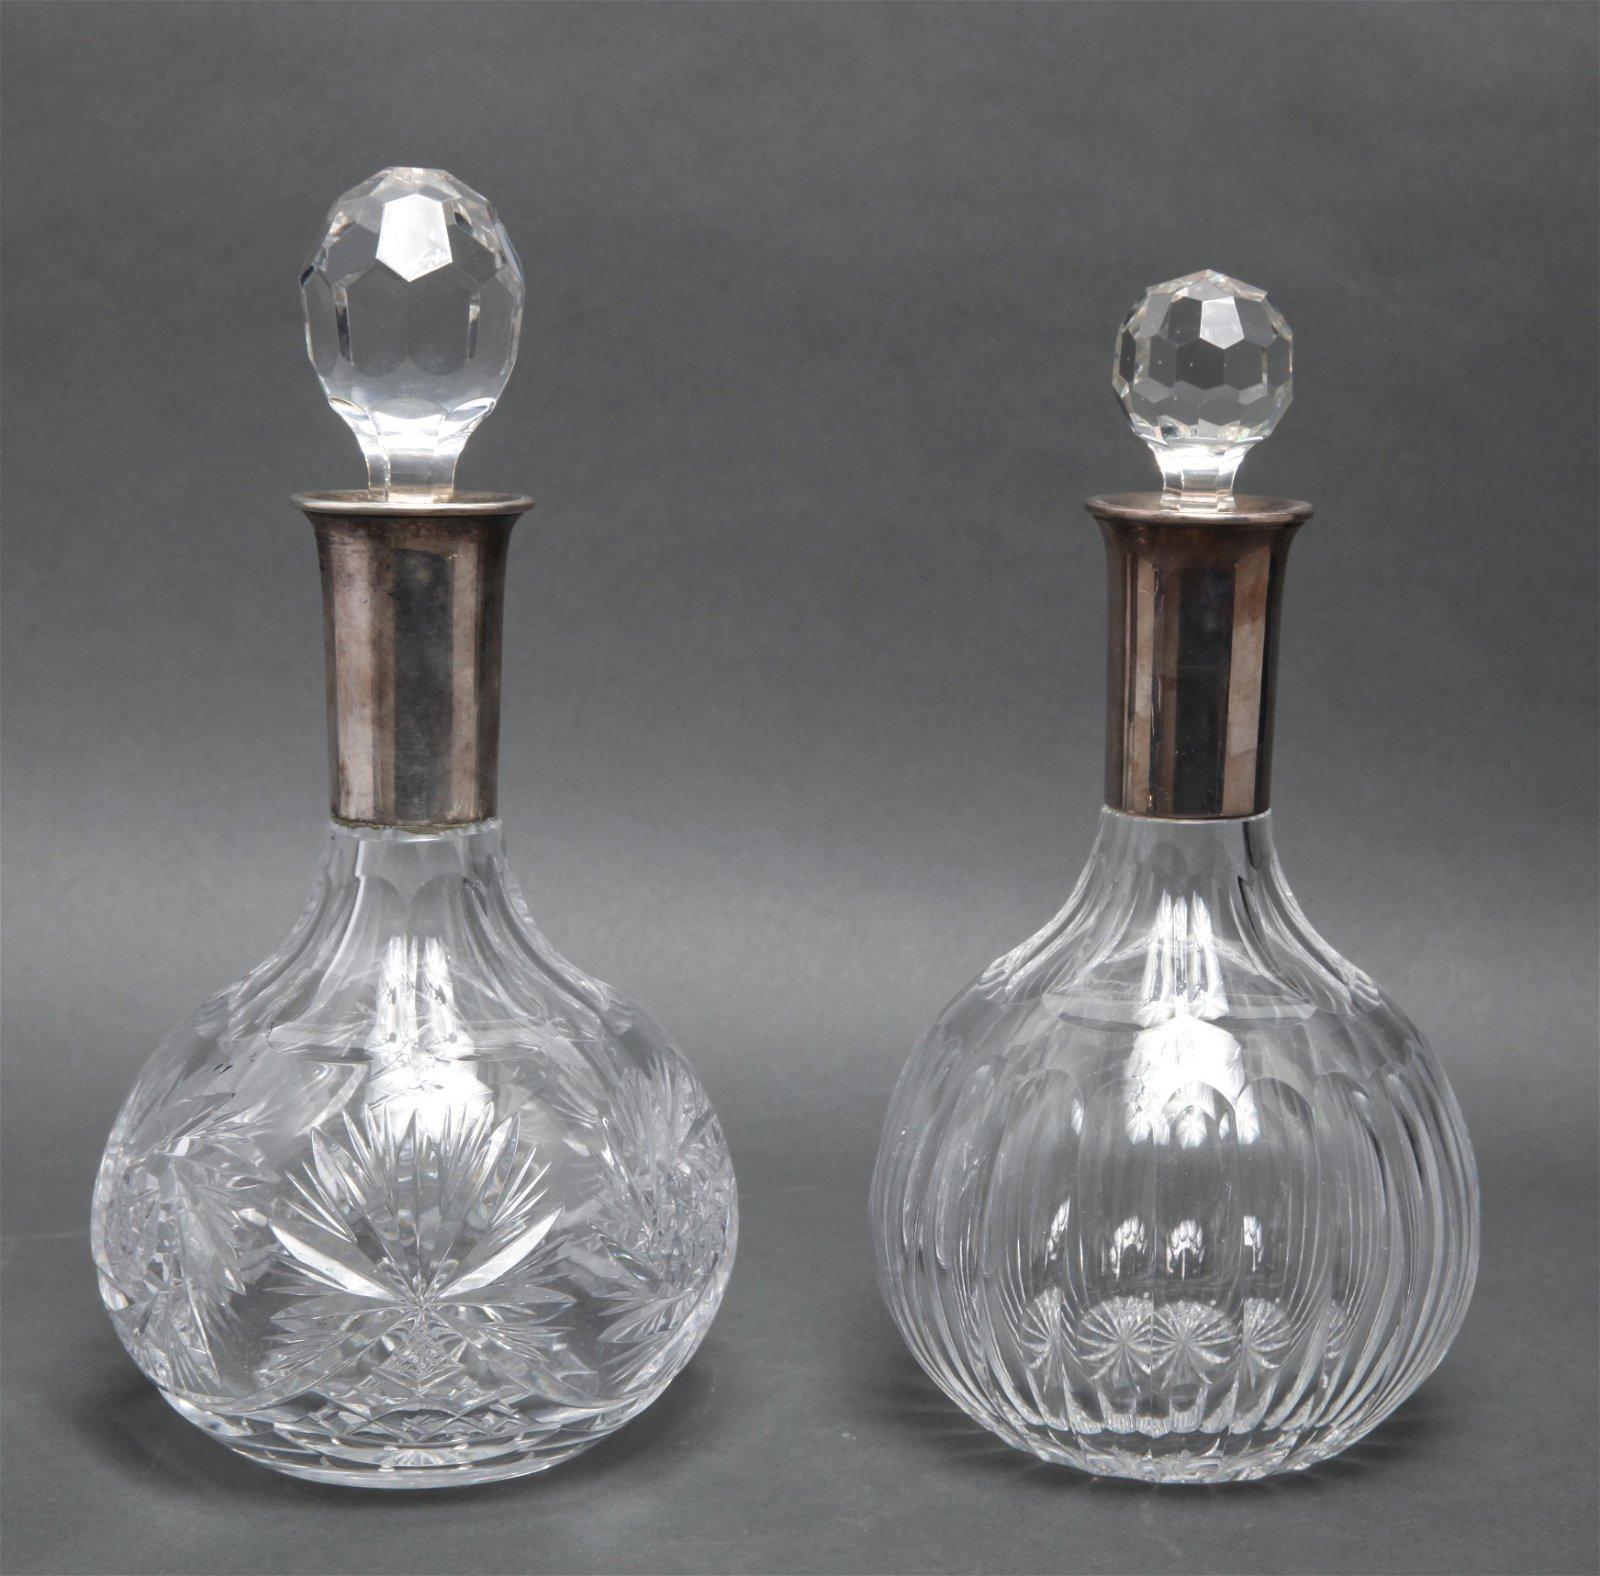 German Sterling Silver & Crystal Decanters, 2